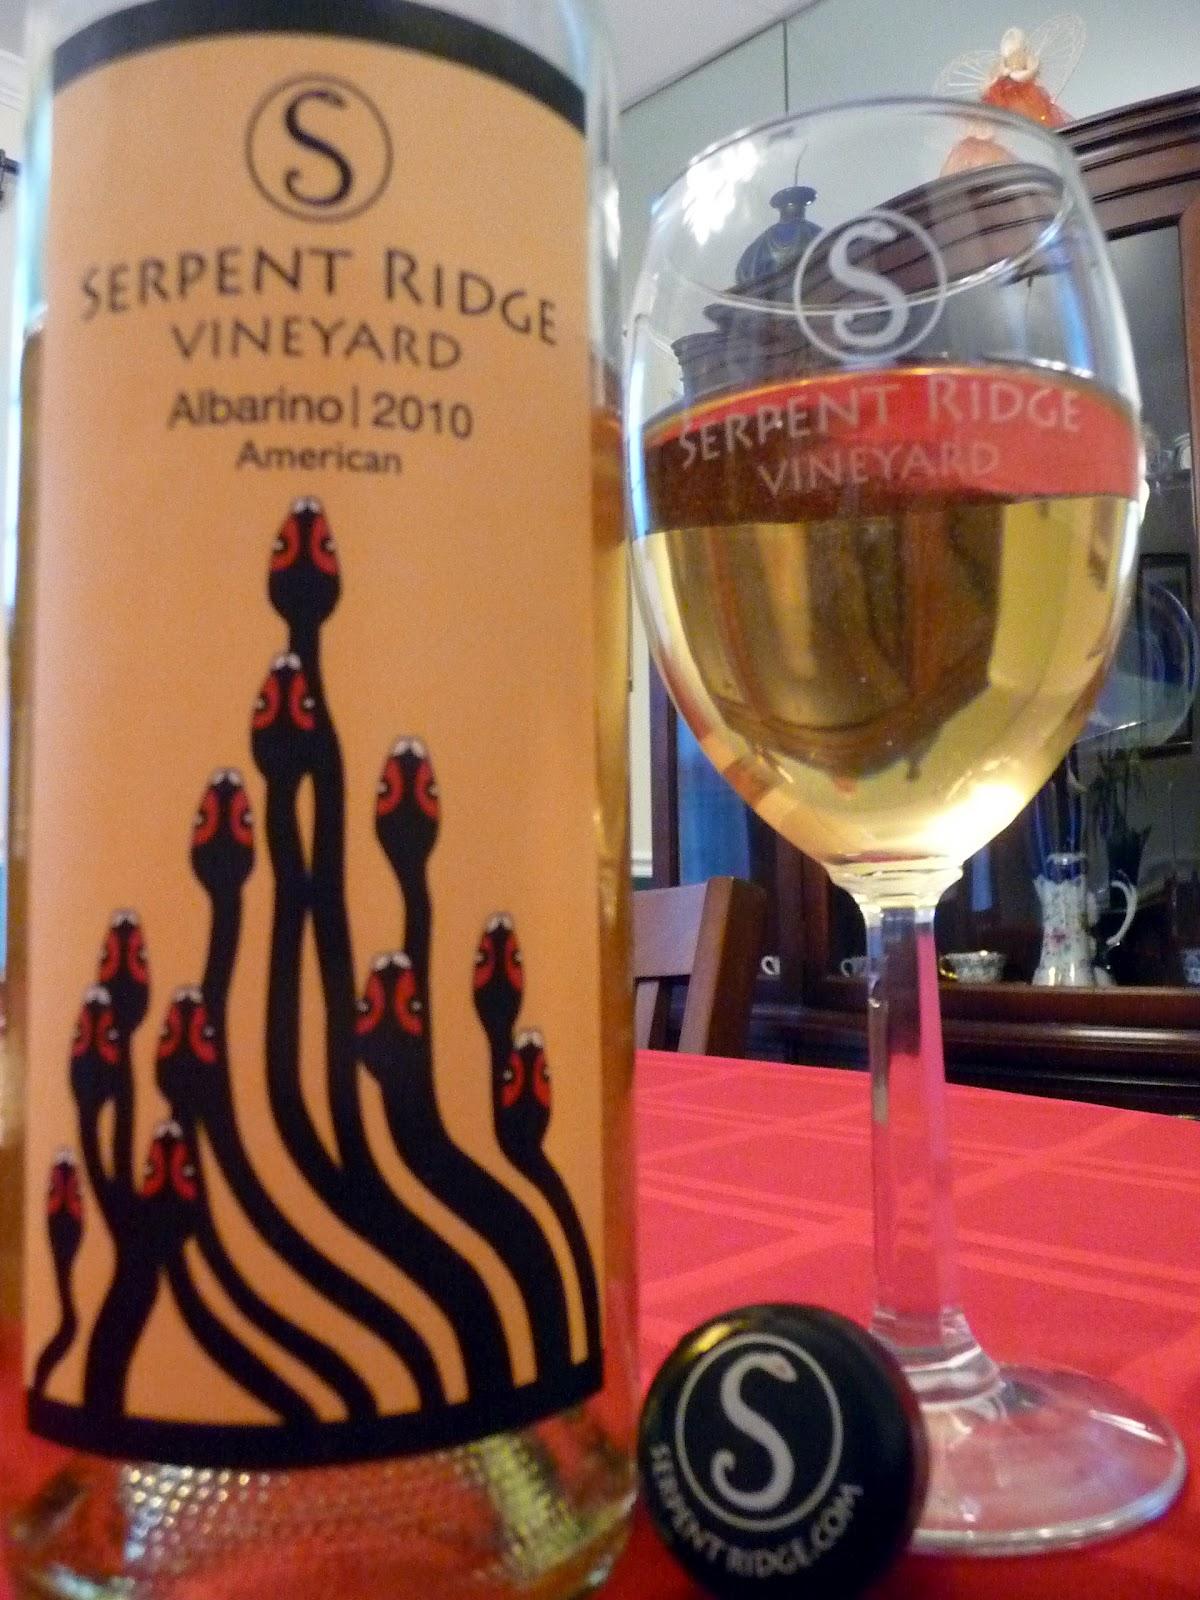 Chef Bolek Serpent Ridge Vineyard Albari 241 O 2010